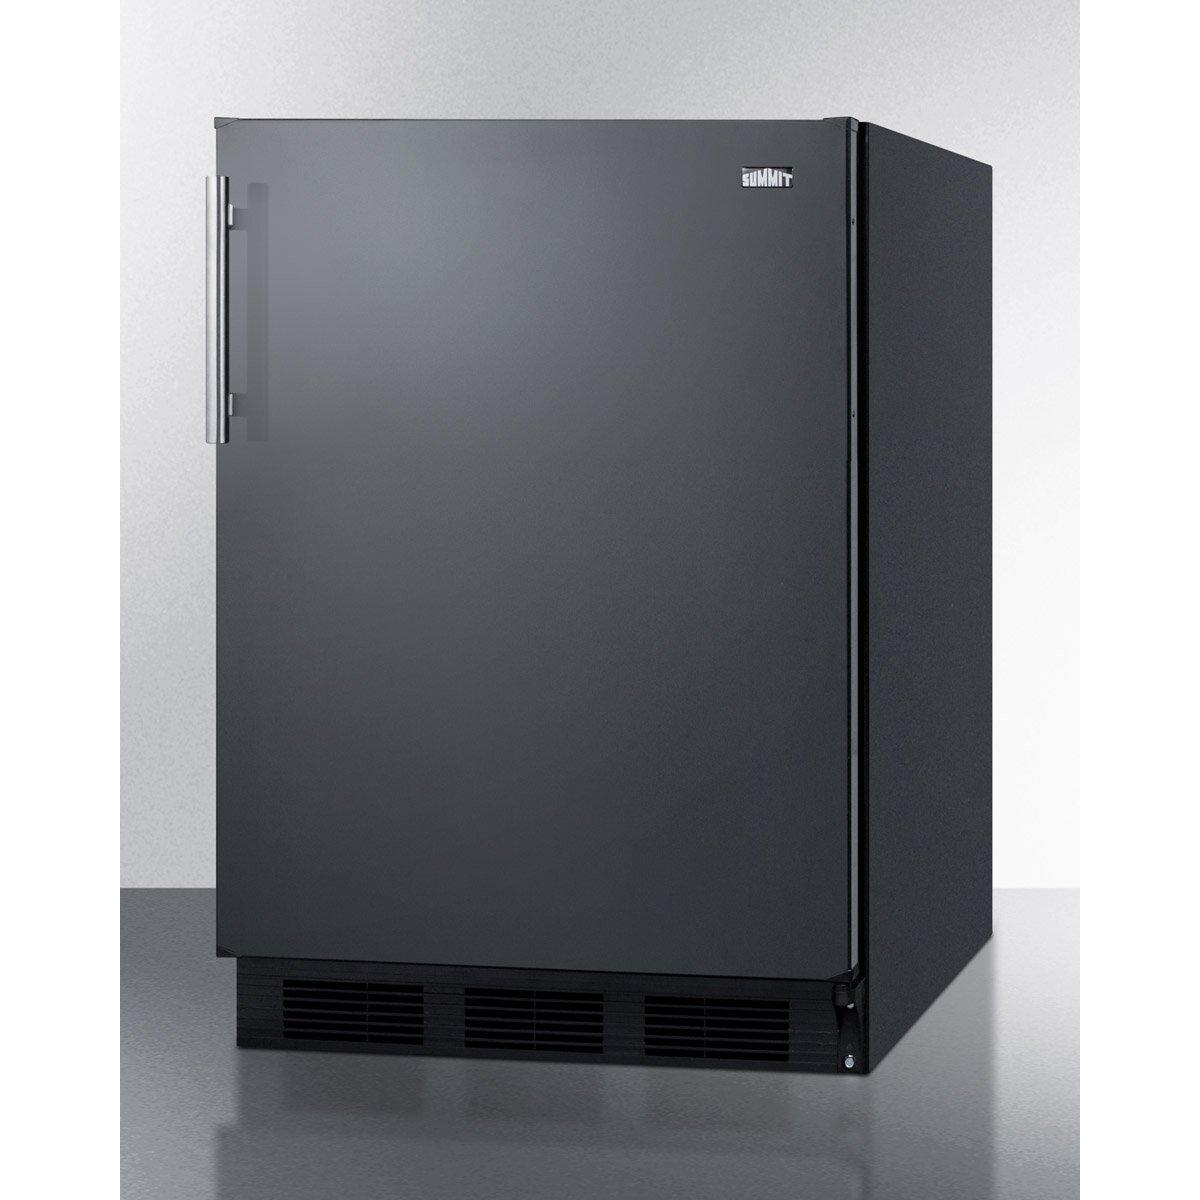 Summit Appliance 5 5 Cu Ft Undercounter Freestanding